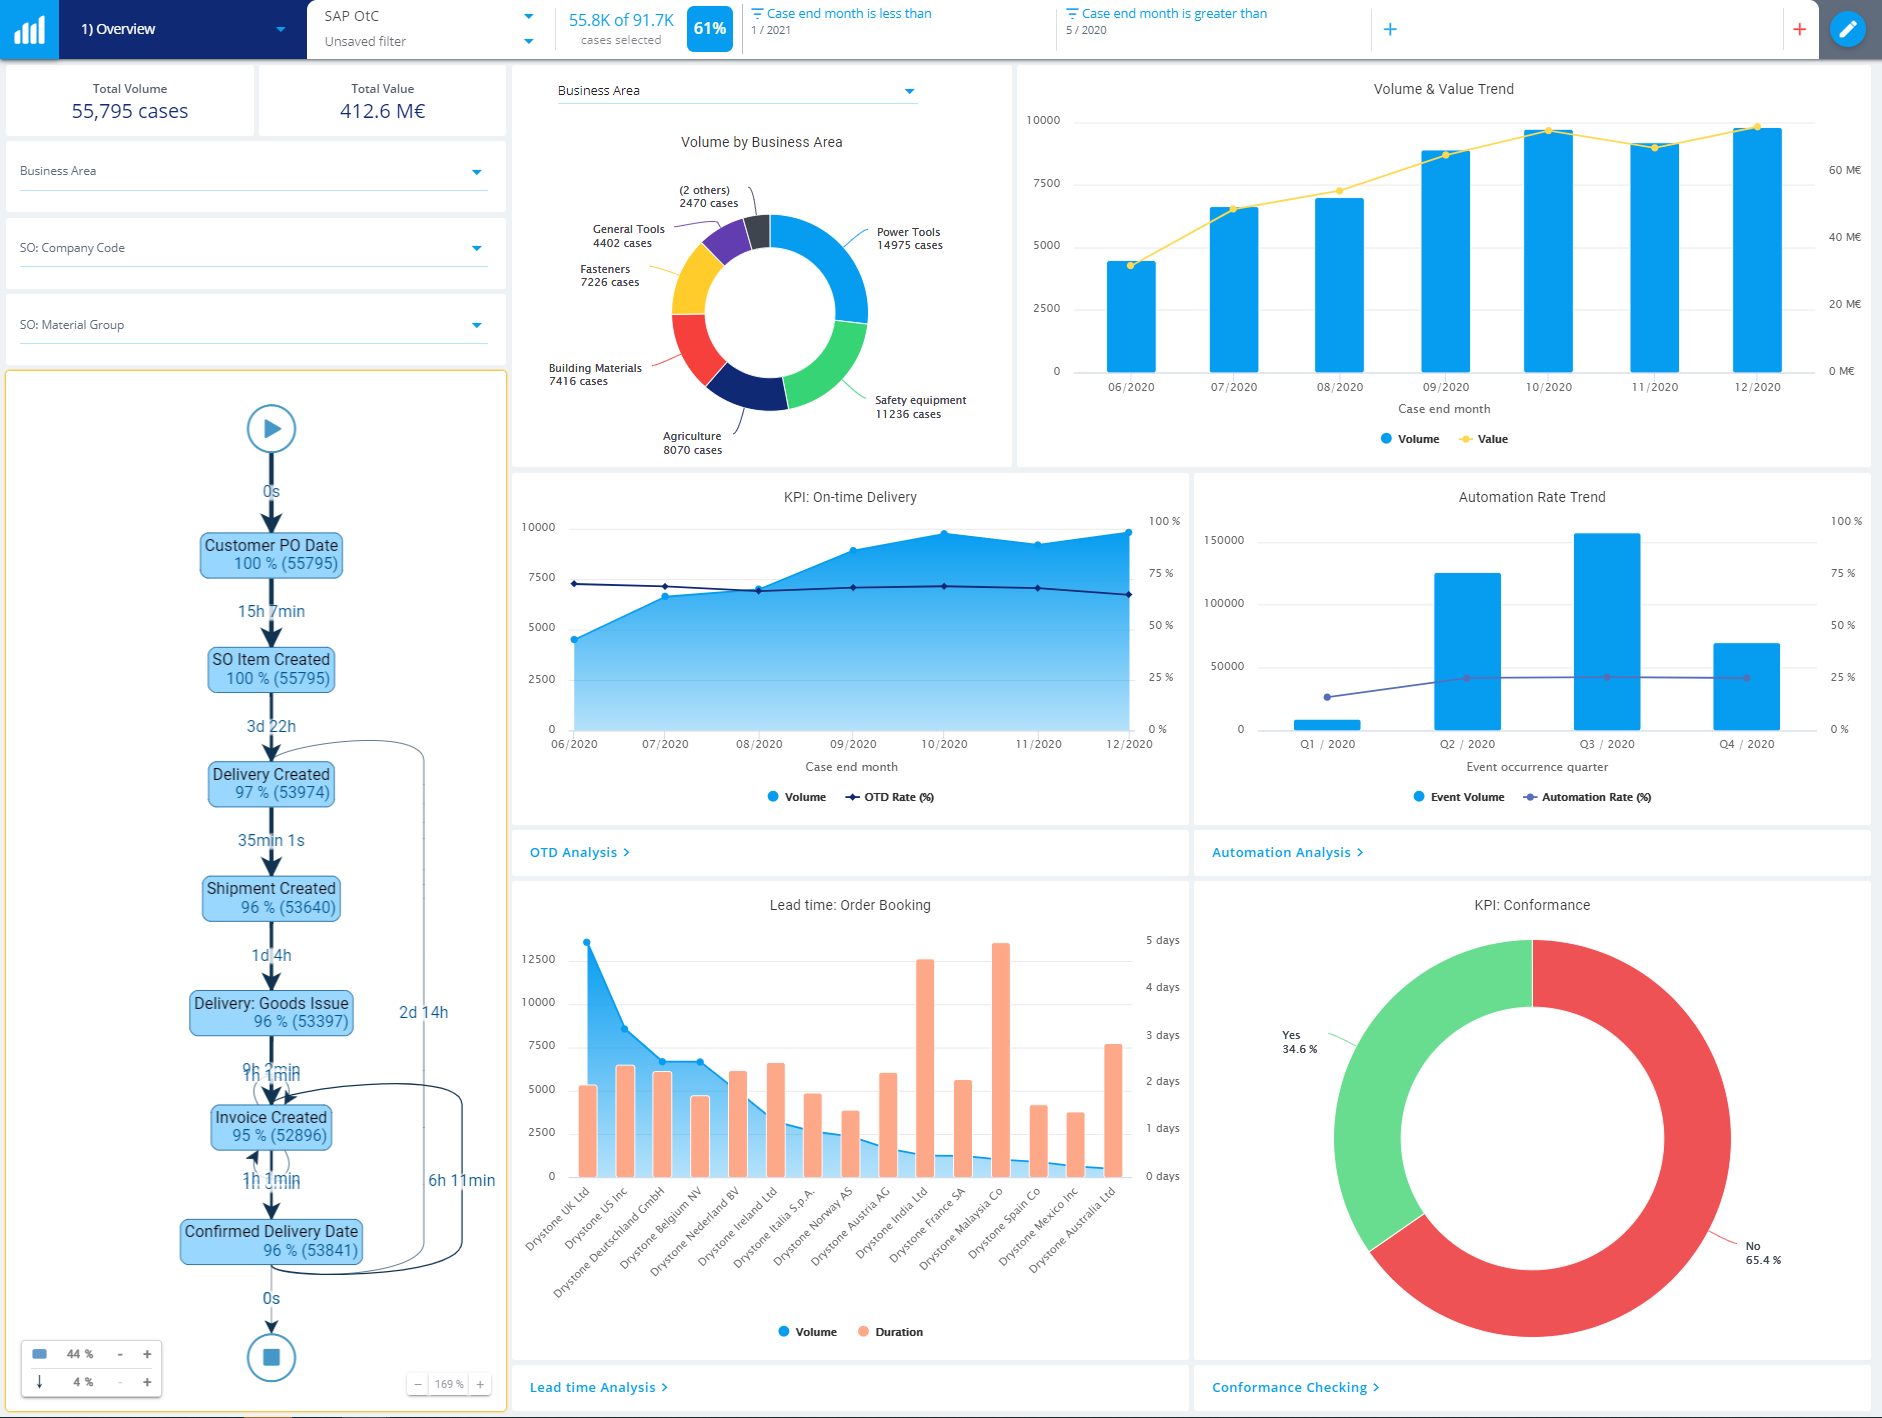 Operations overview QPR ProcessAnalyzer dashboard